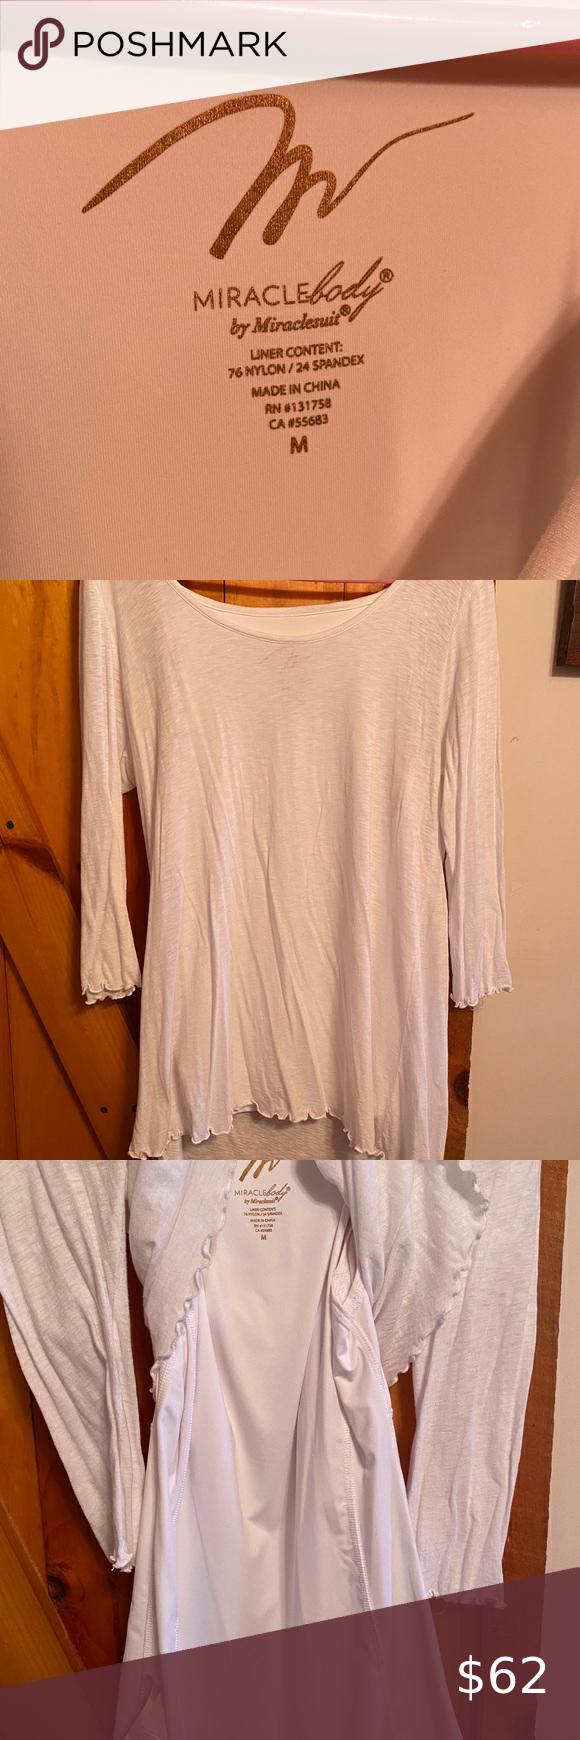 Rosme Wholesale Clothing Online, Women`s Fashion, Shoes, Lingerie & Underwear - Matterhorn